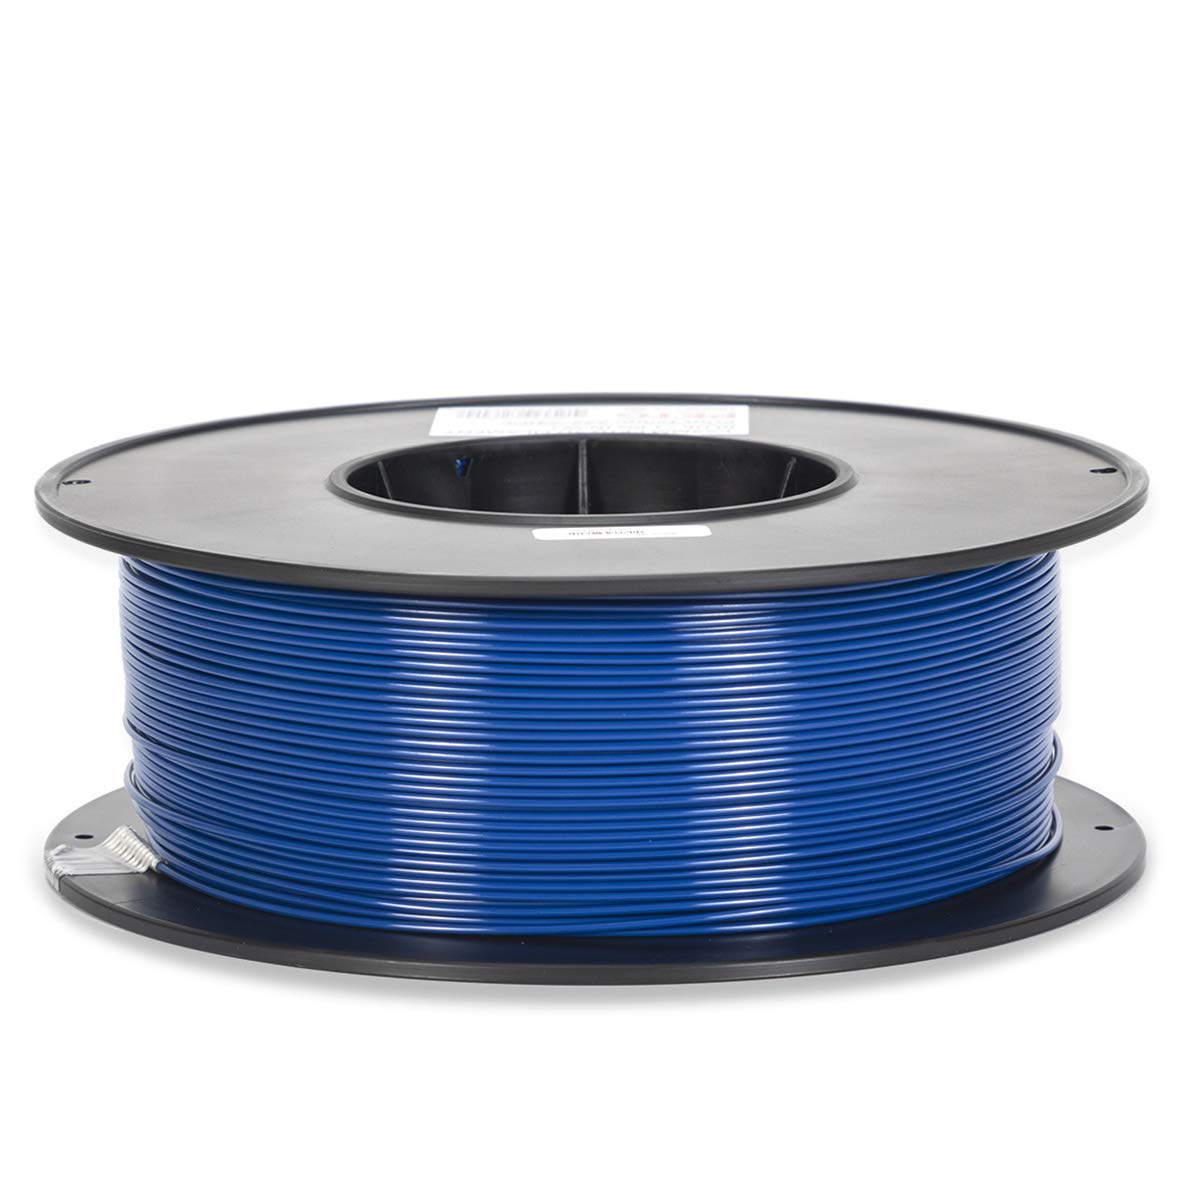 PETG Filament - 1.75 - Blue - Inland